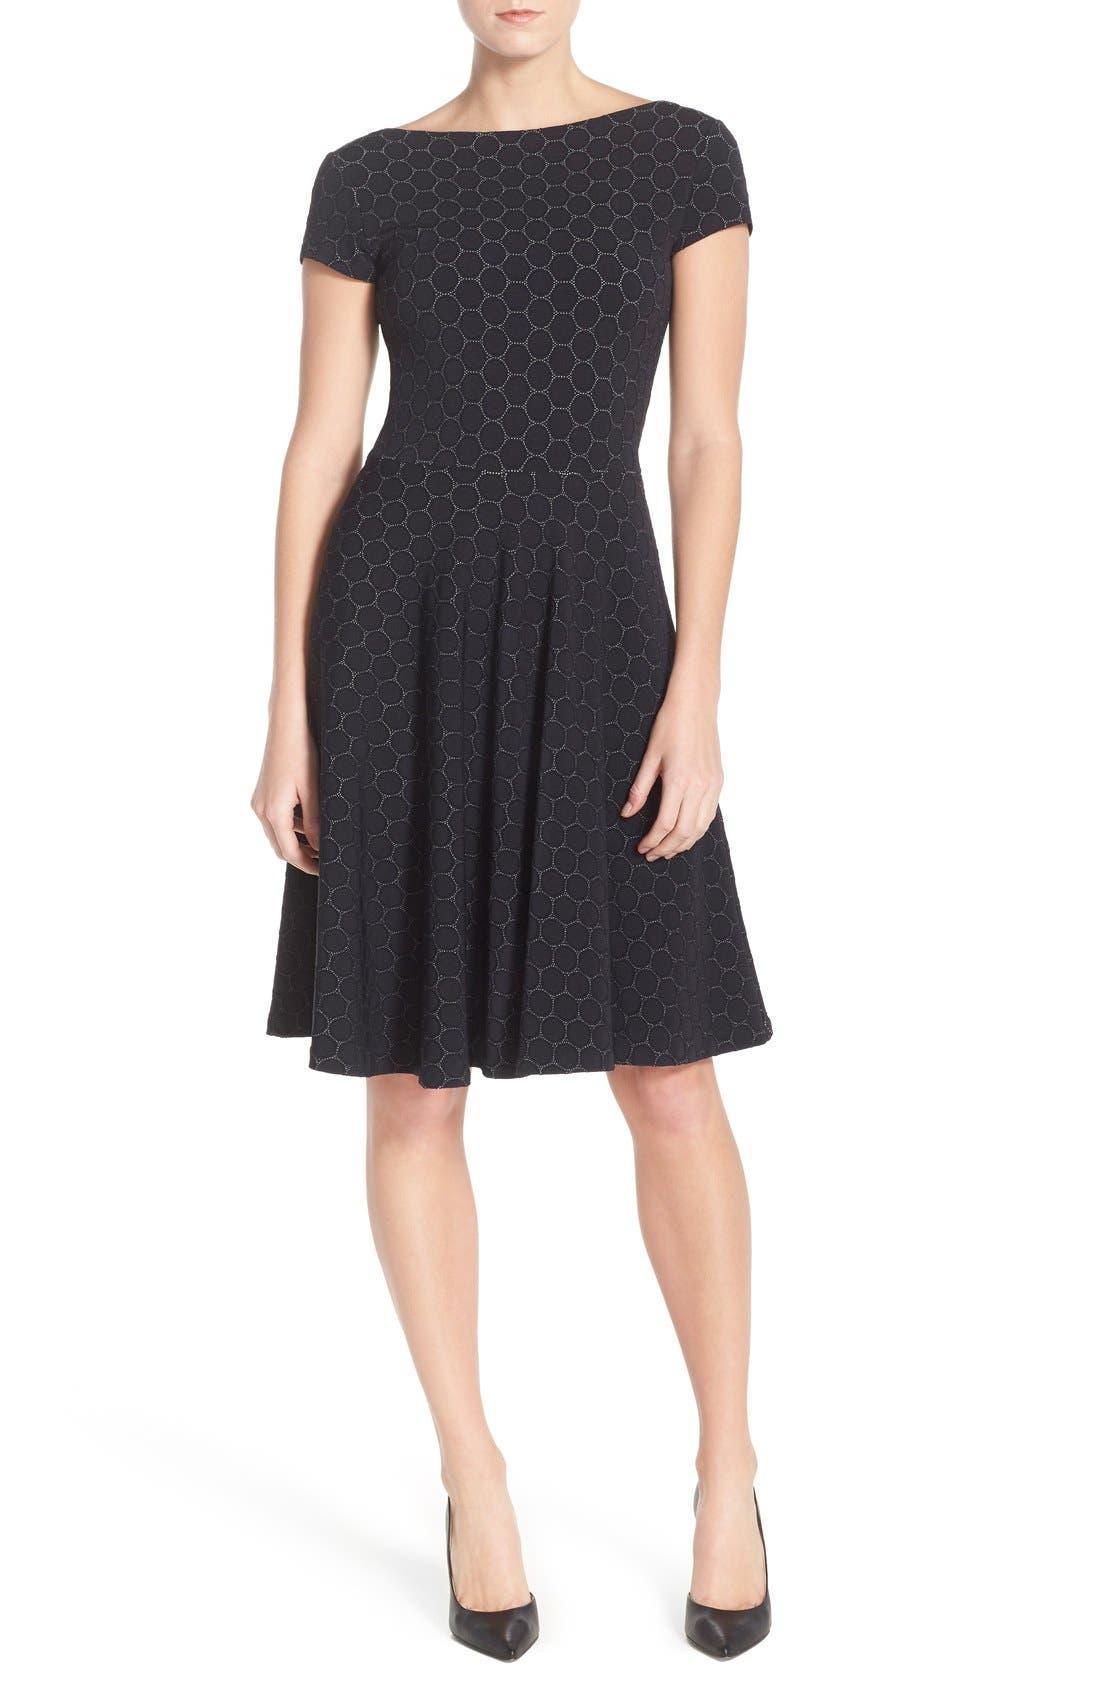 'Circle' Jacquard Woven Jersey Dress, Main, color, BLACK CAMEO CLOTH